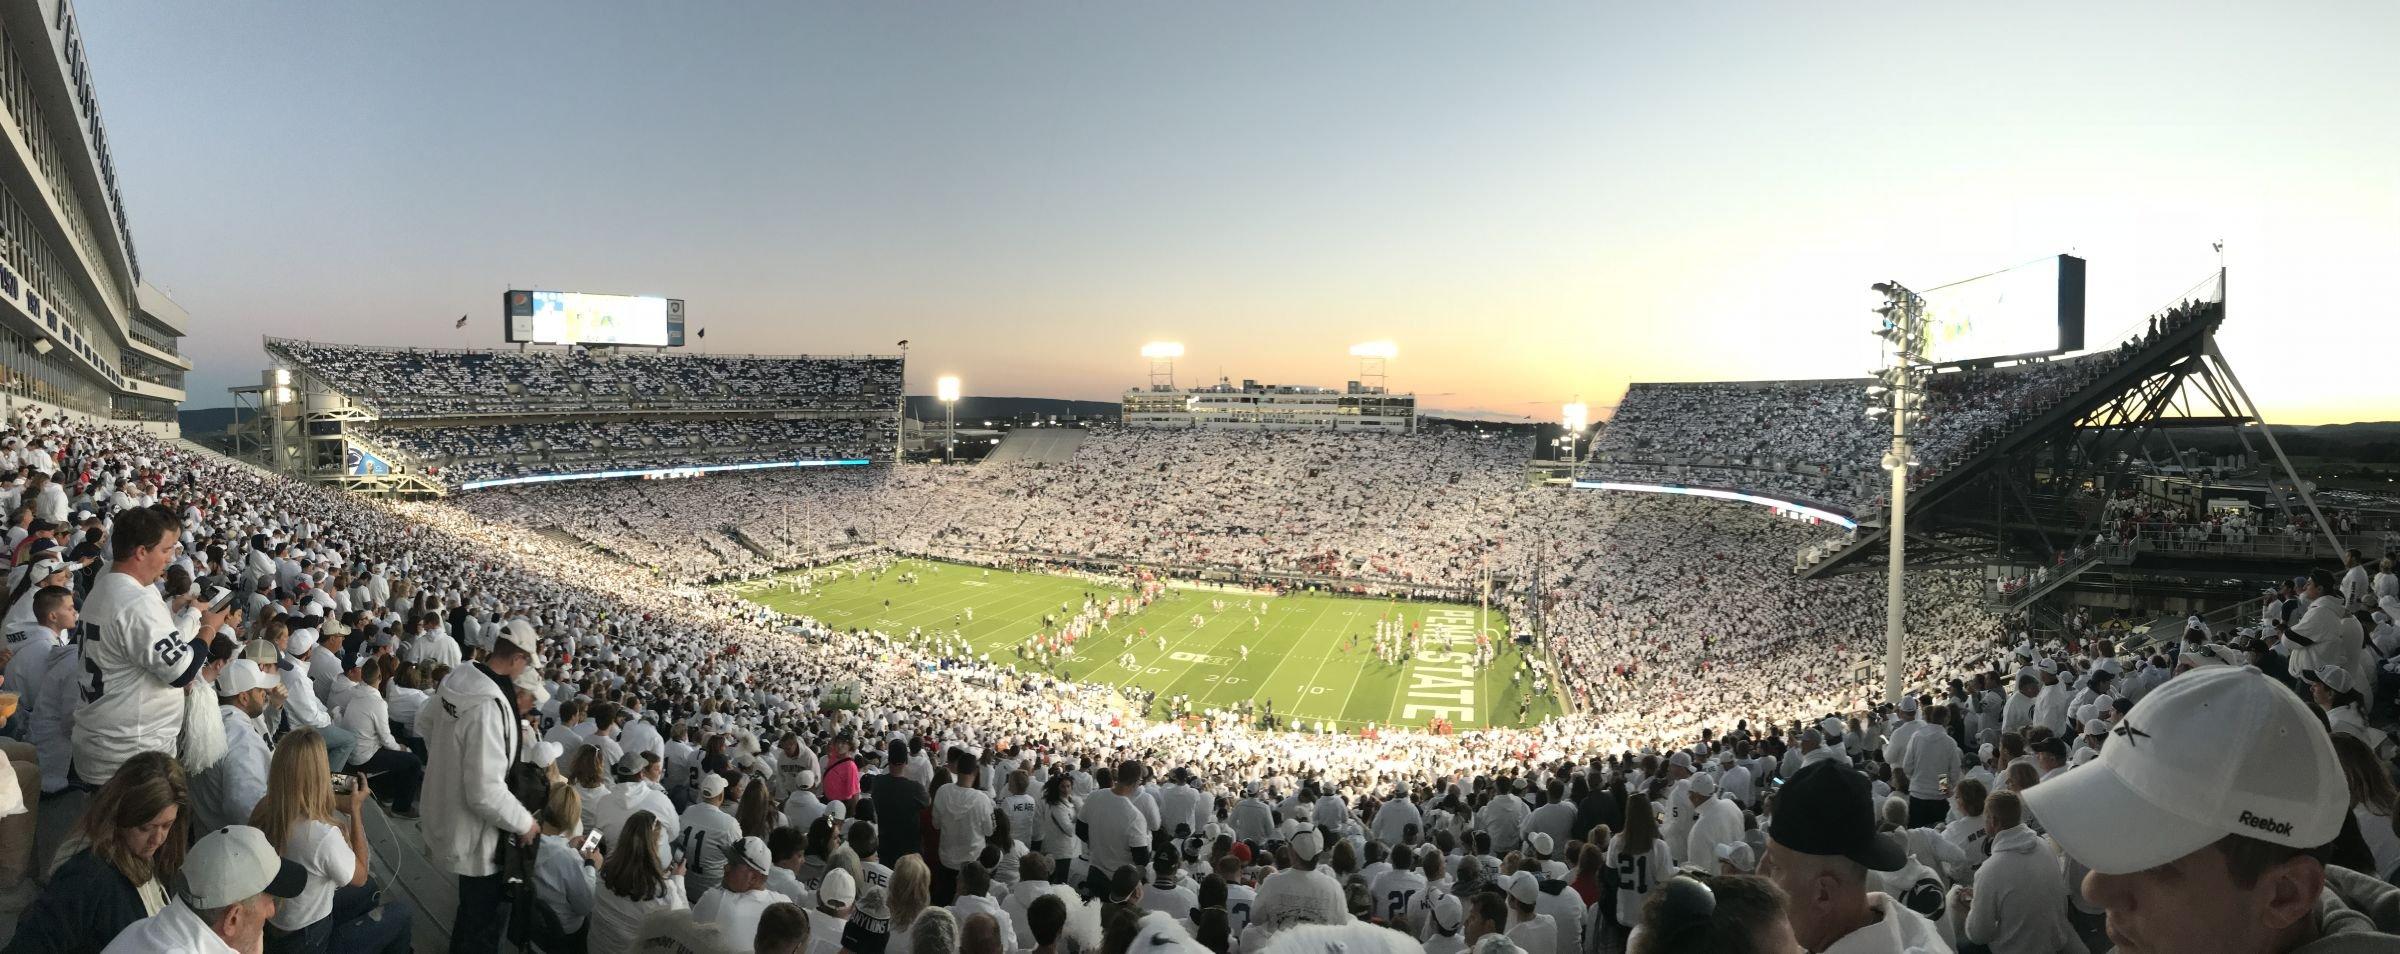 Section SA seat view